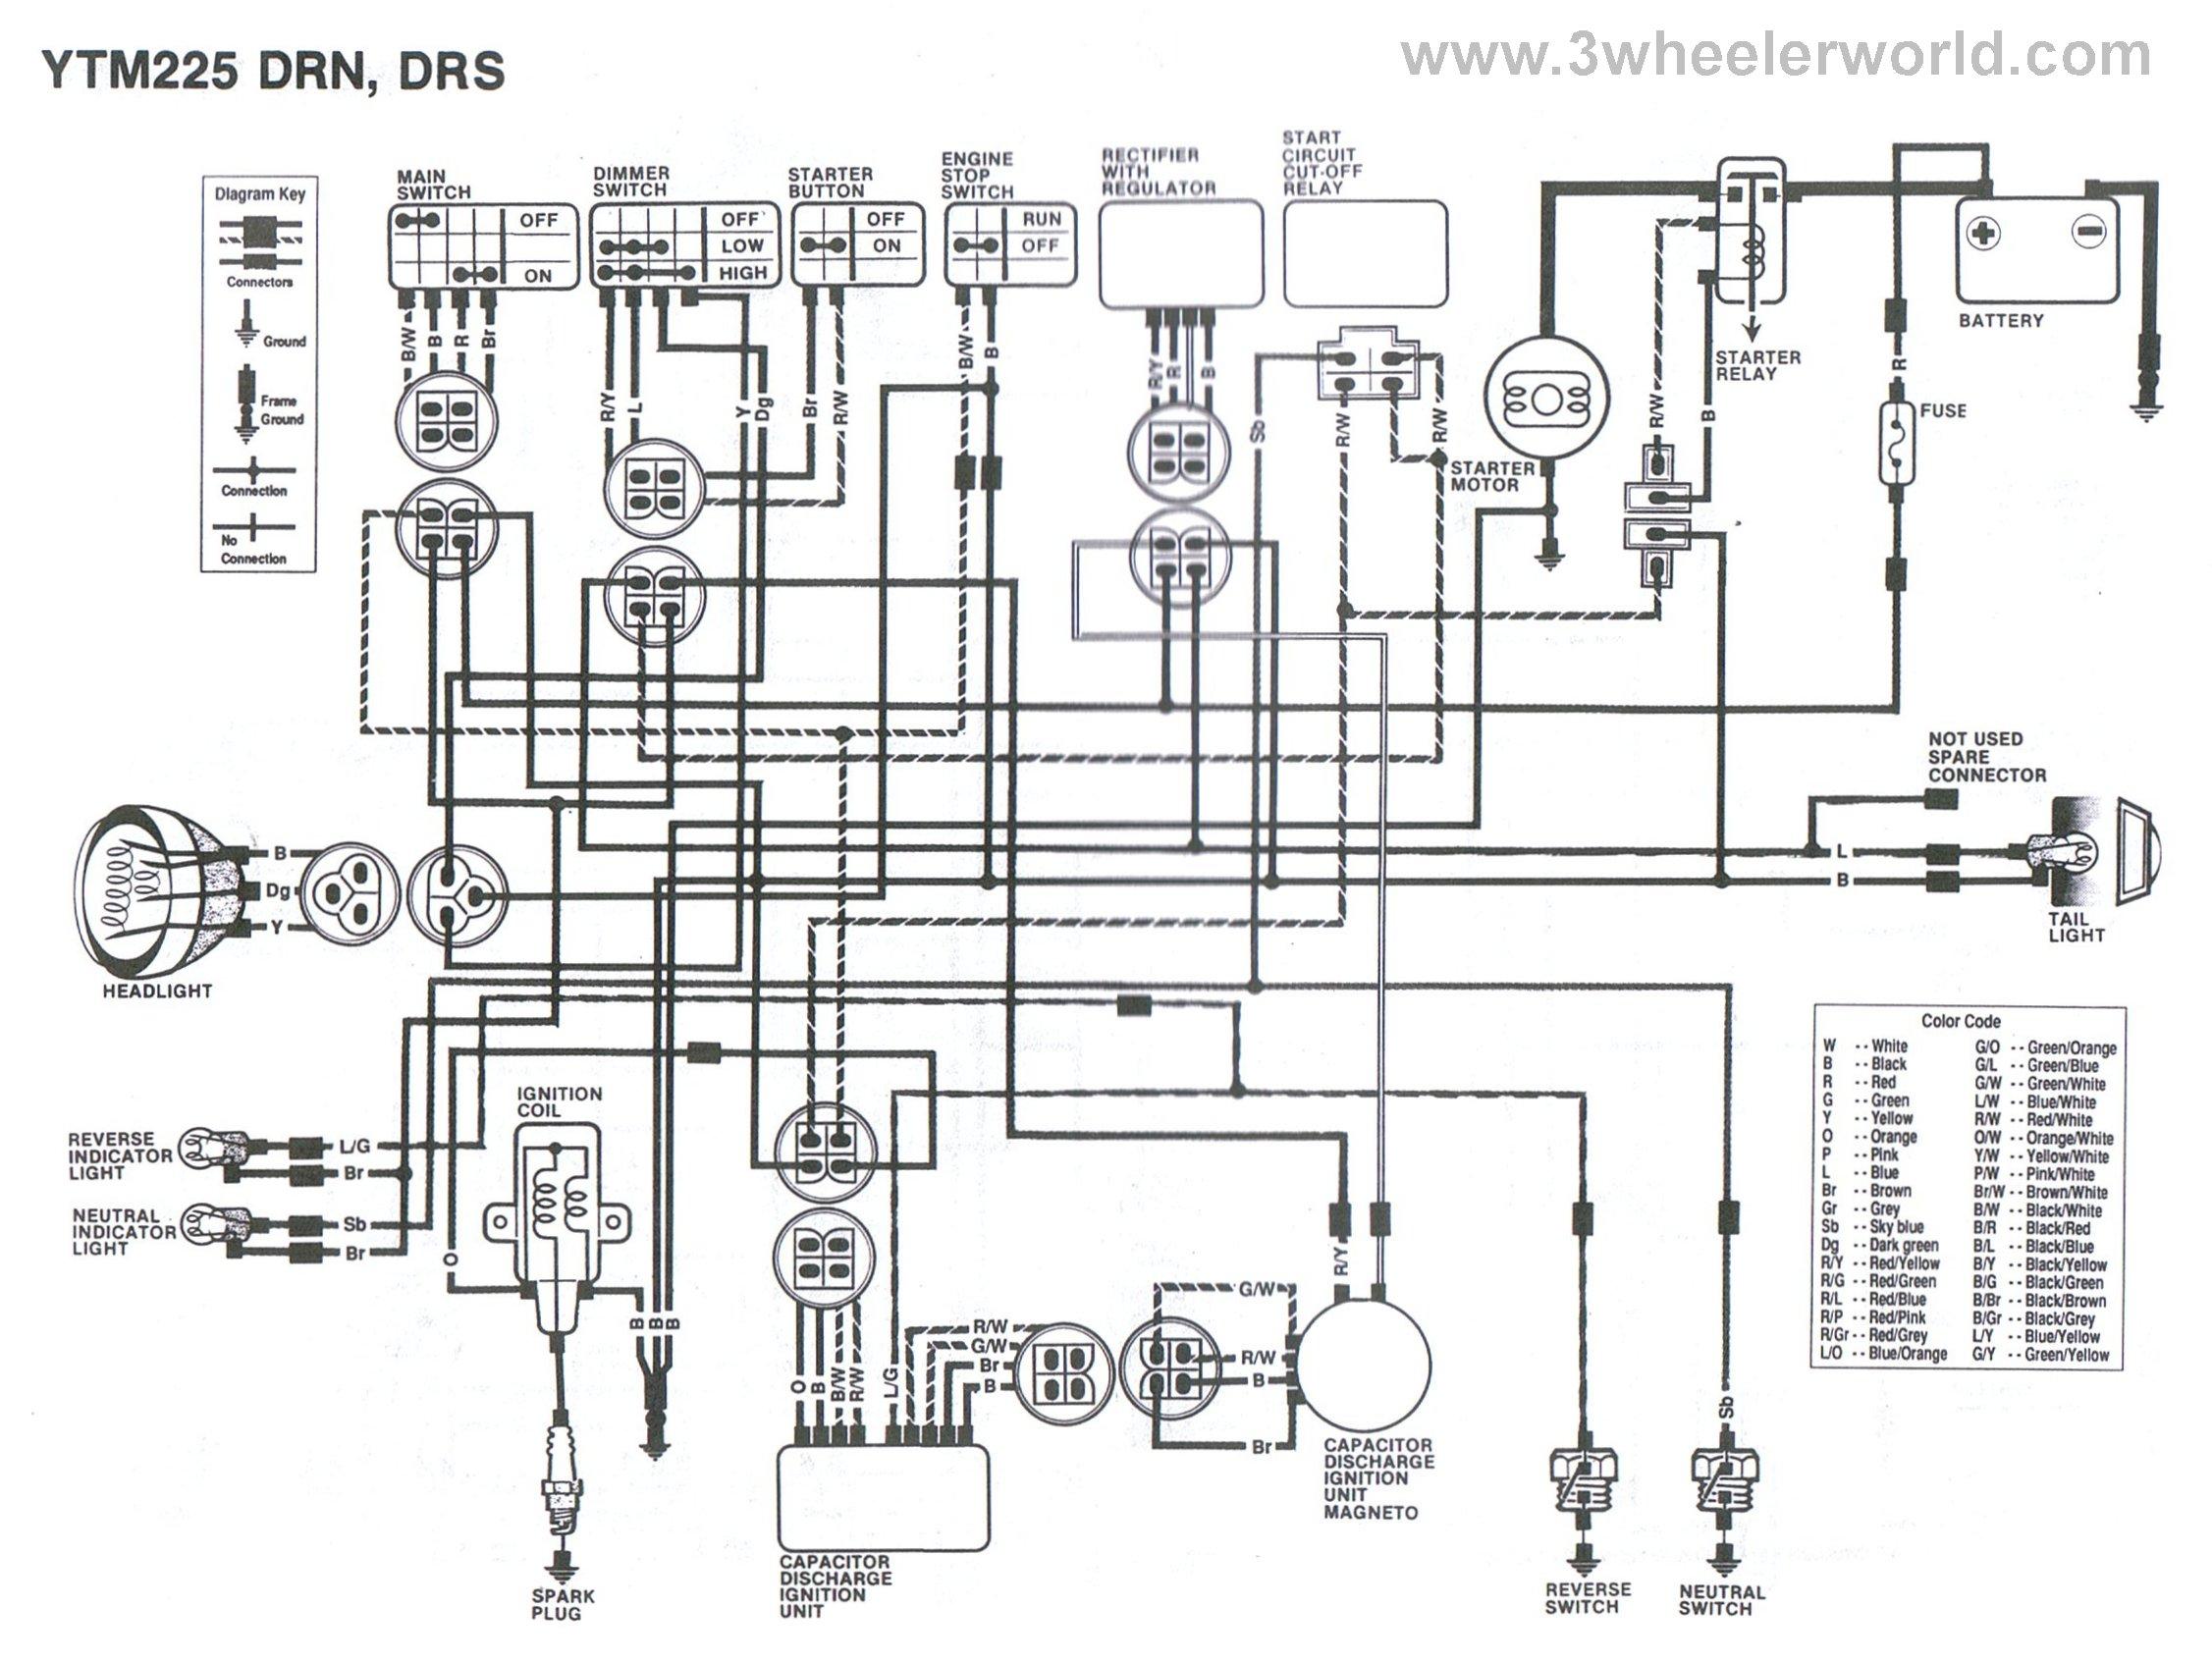 1978 Yamaha Dt125 Wiring Schematic Best Secret Diagram Images Gallery